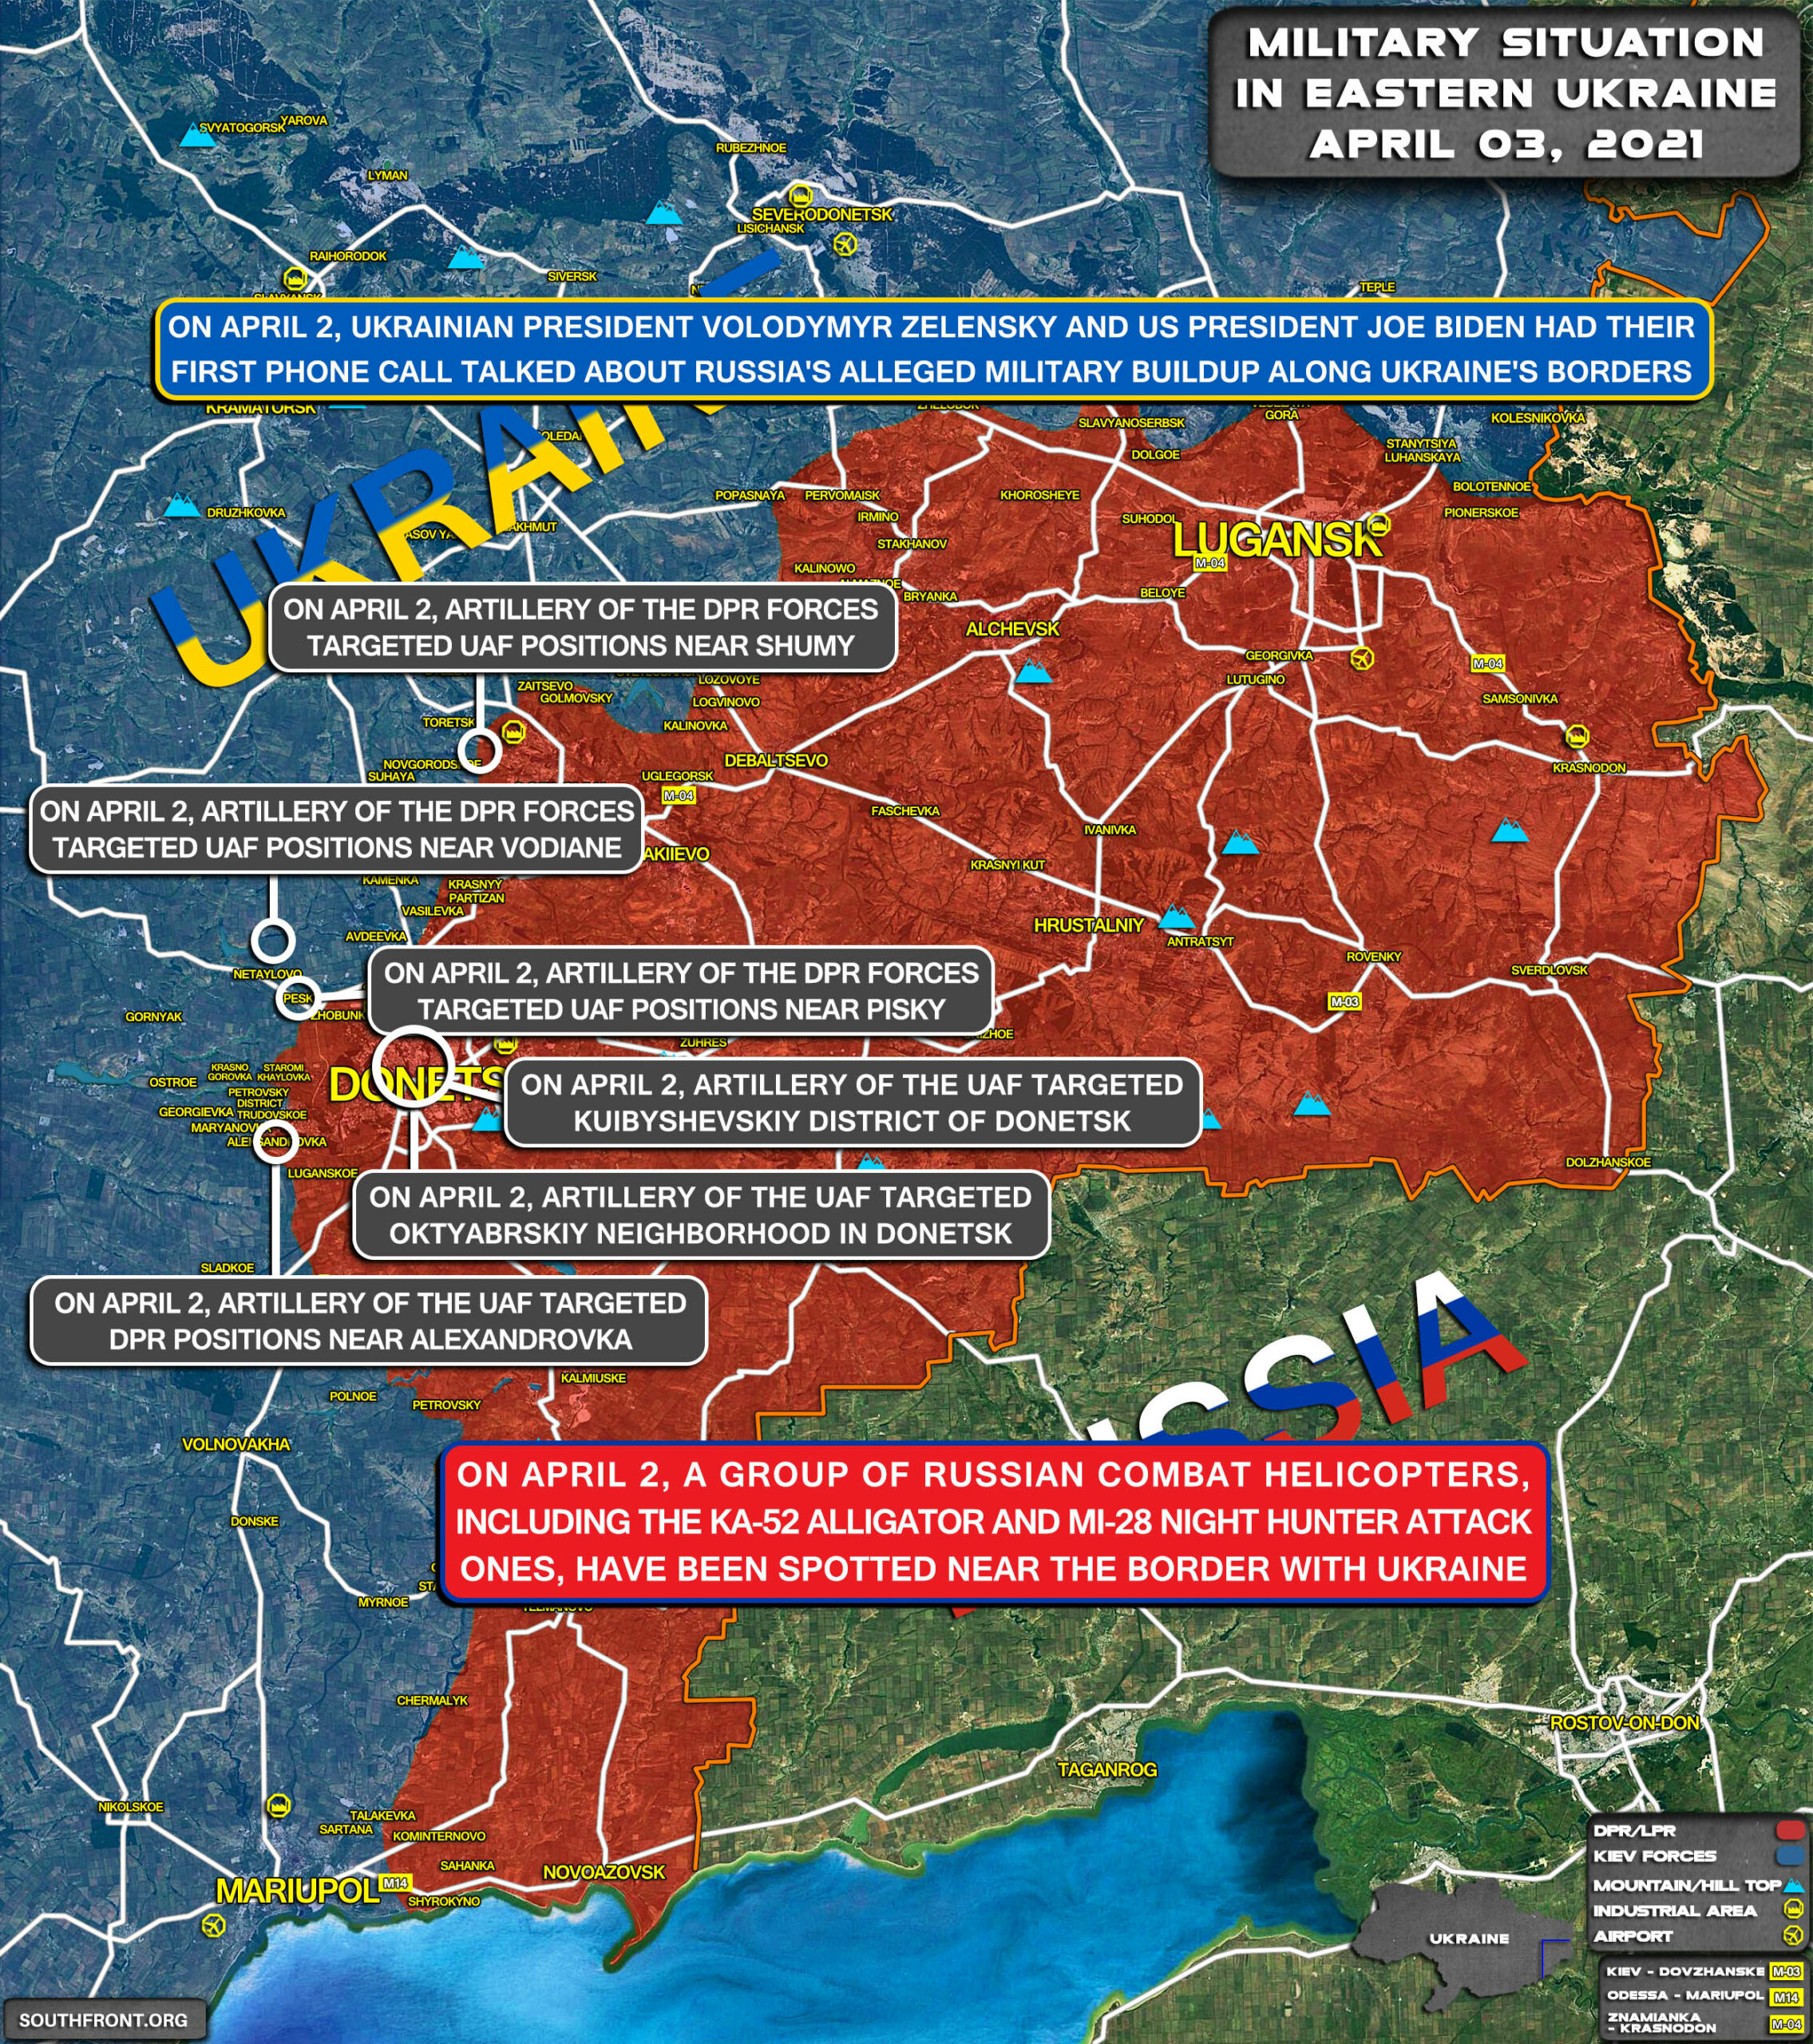 Artillery Fire, Drone Attacks, Child Killed. Did War In Ukraine Begin? (Videos, Map Update)